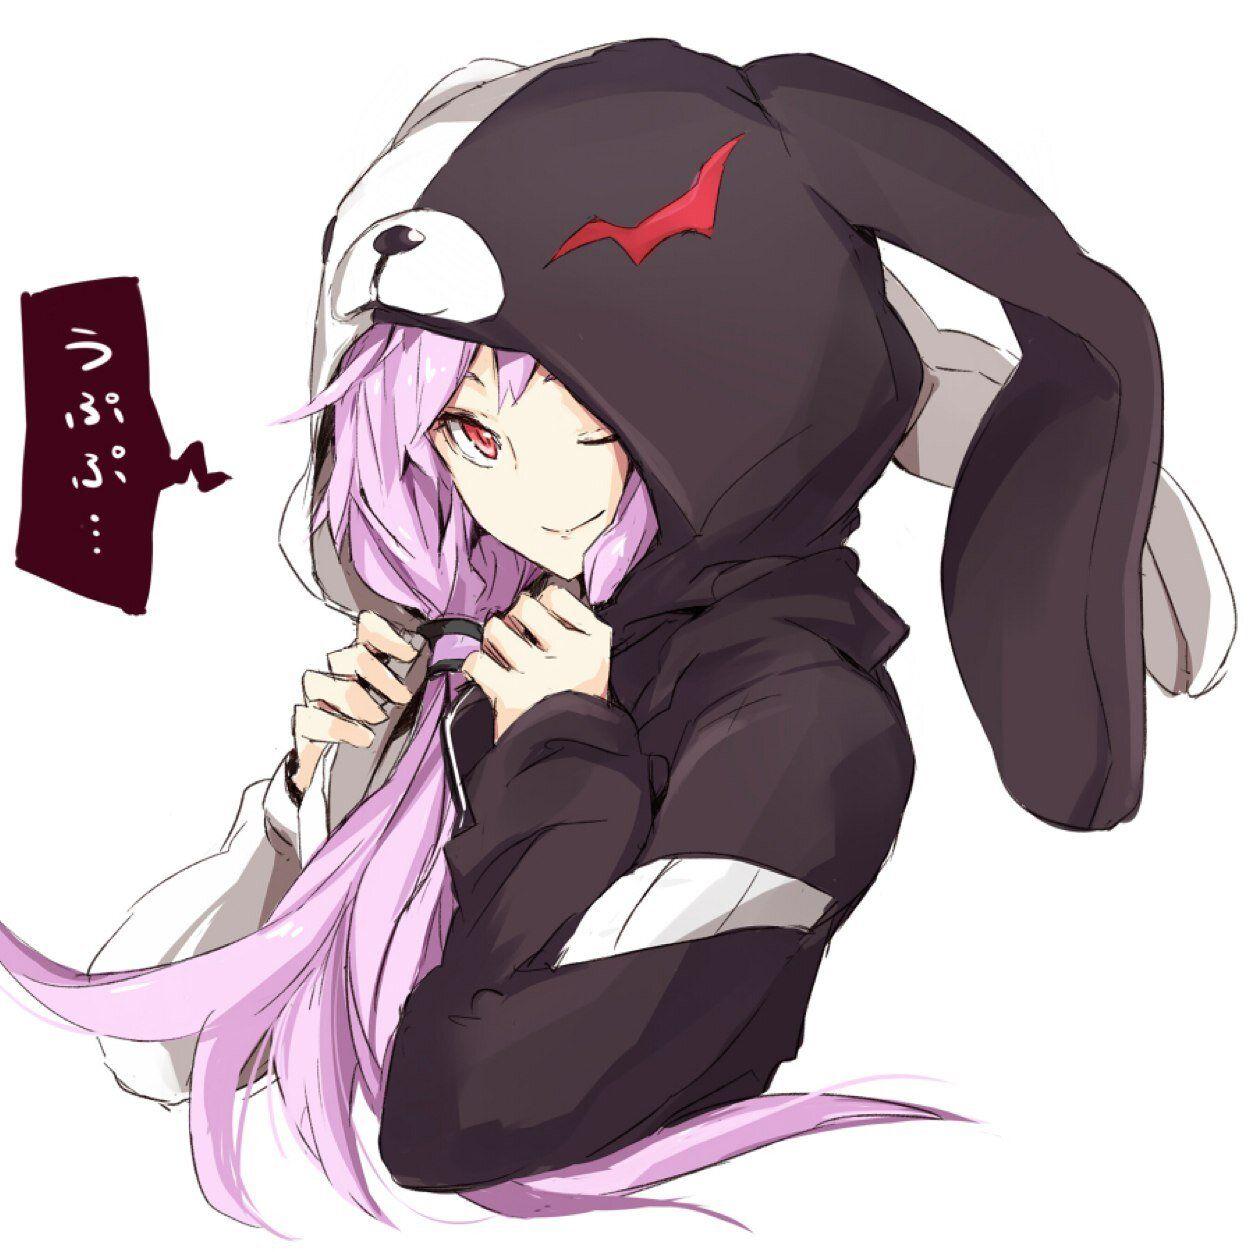 Anime Girl In Hoodie: Yuzuki Yukari Wearing A Bunny Monokuma Hoodie XD